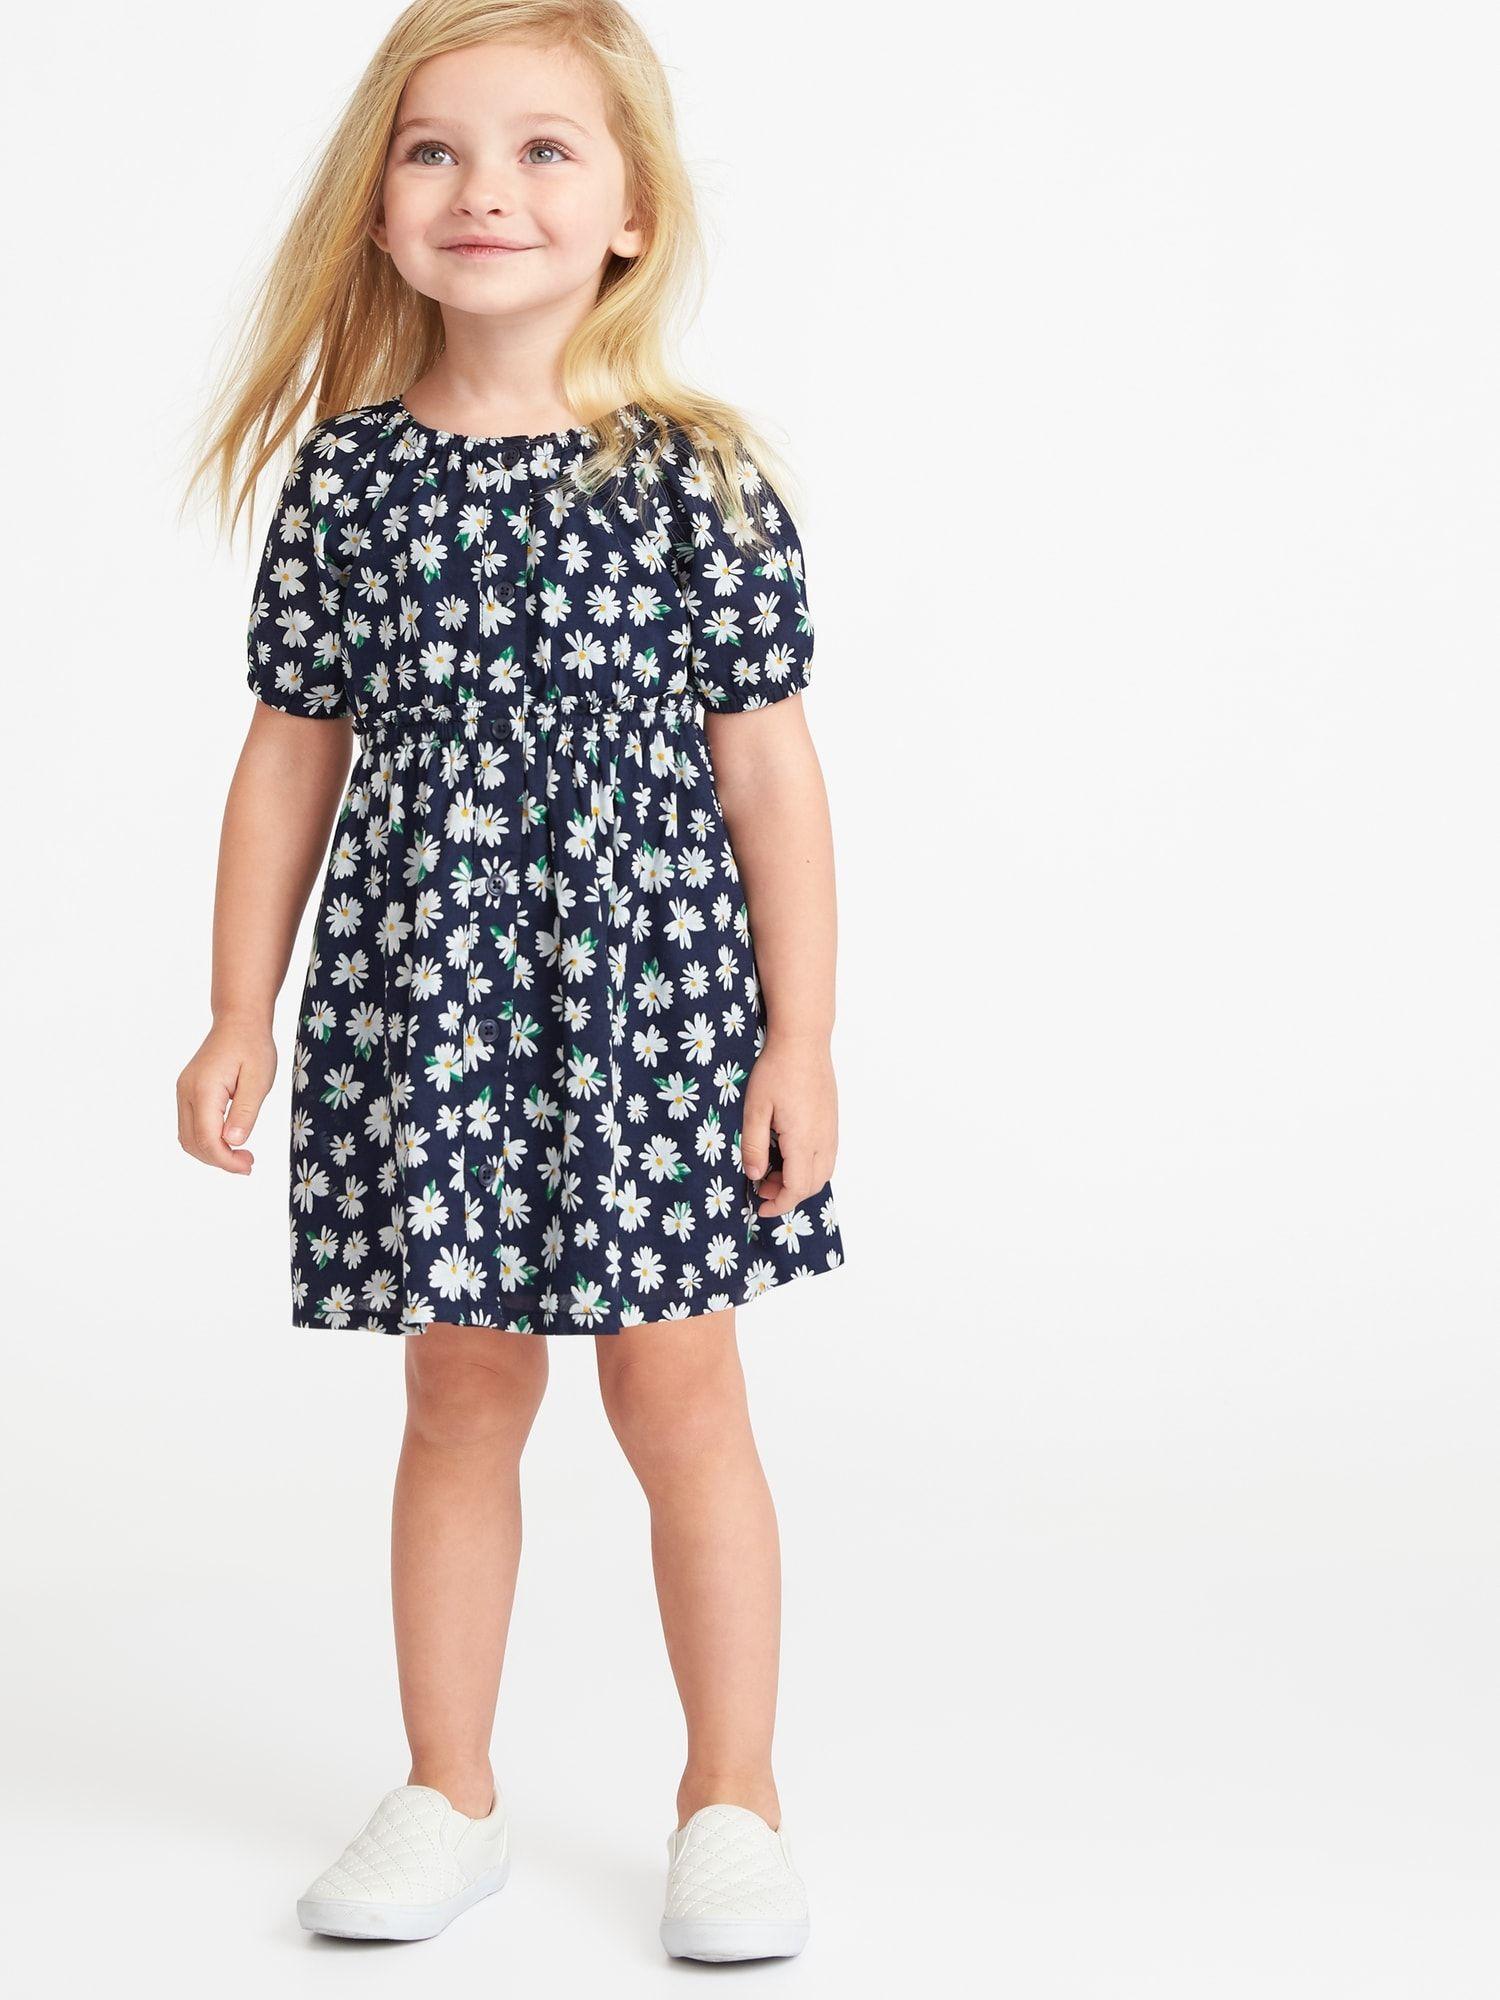 612aaa25c1b8 Floral-Print Shirt Dress for Toddler Girls   Daughter   Floral print ...